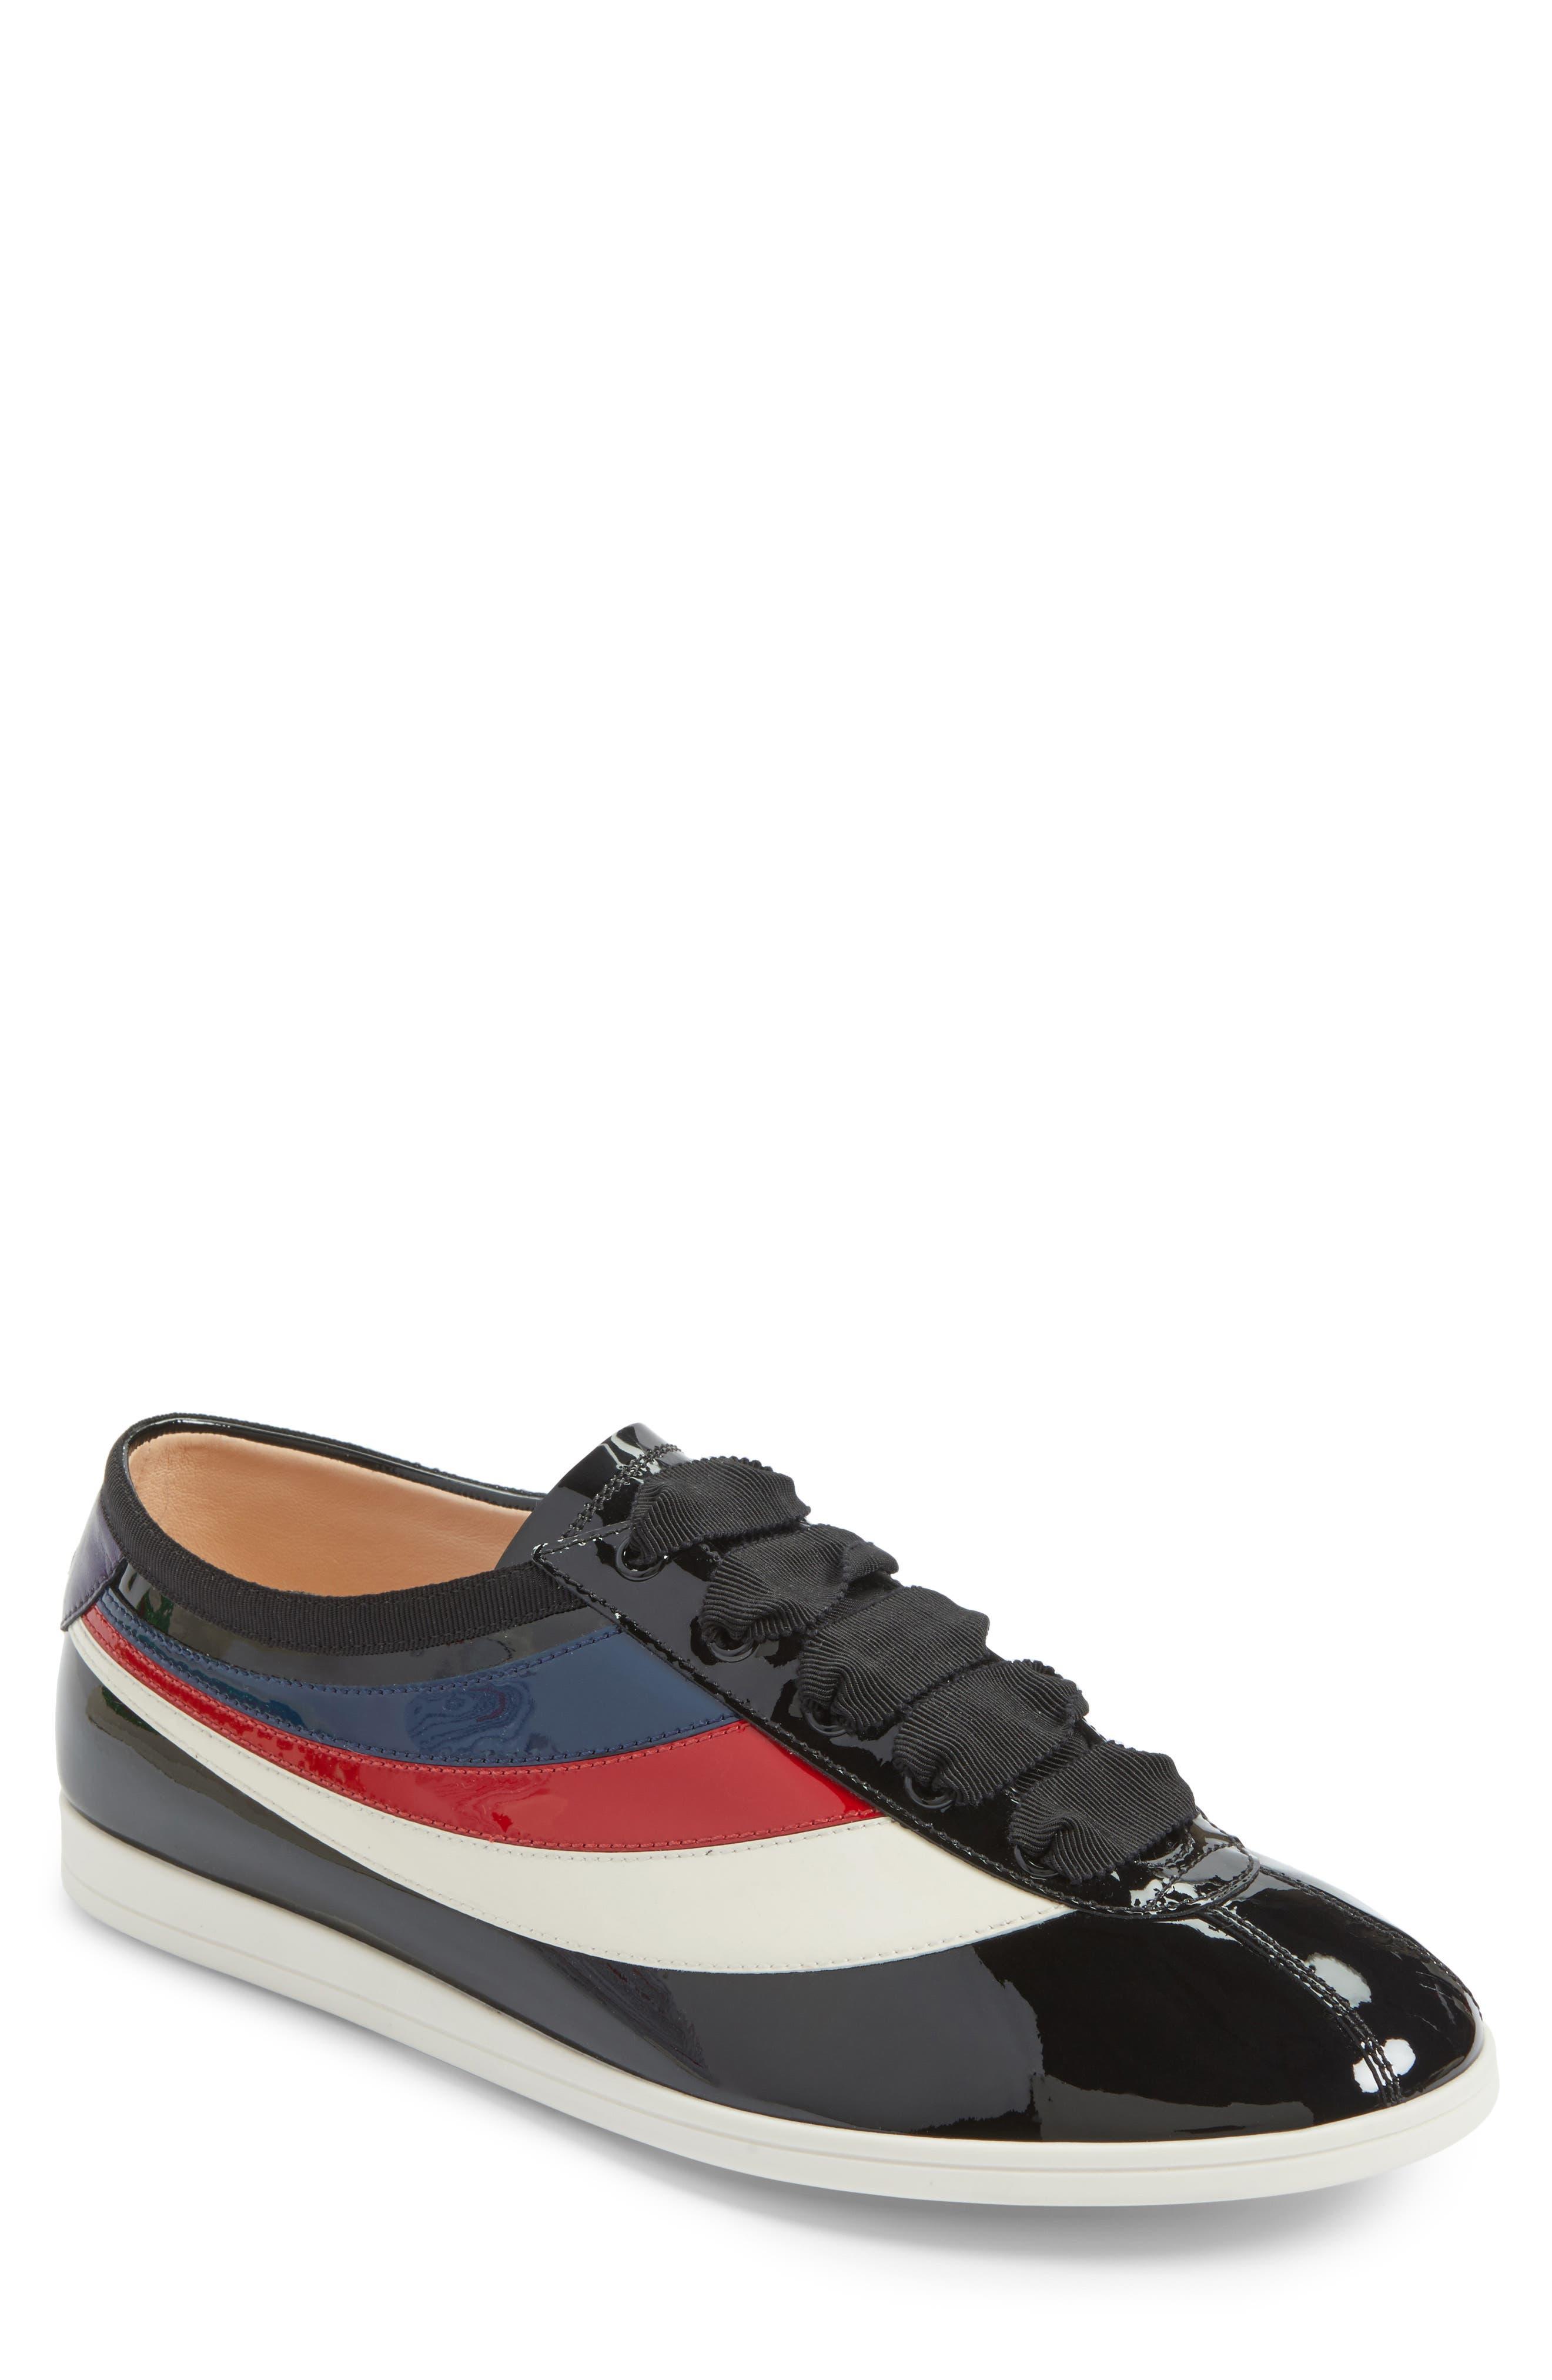 Falacer Sneaker,                             Main thumbnail 1, color,                             007